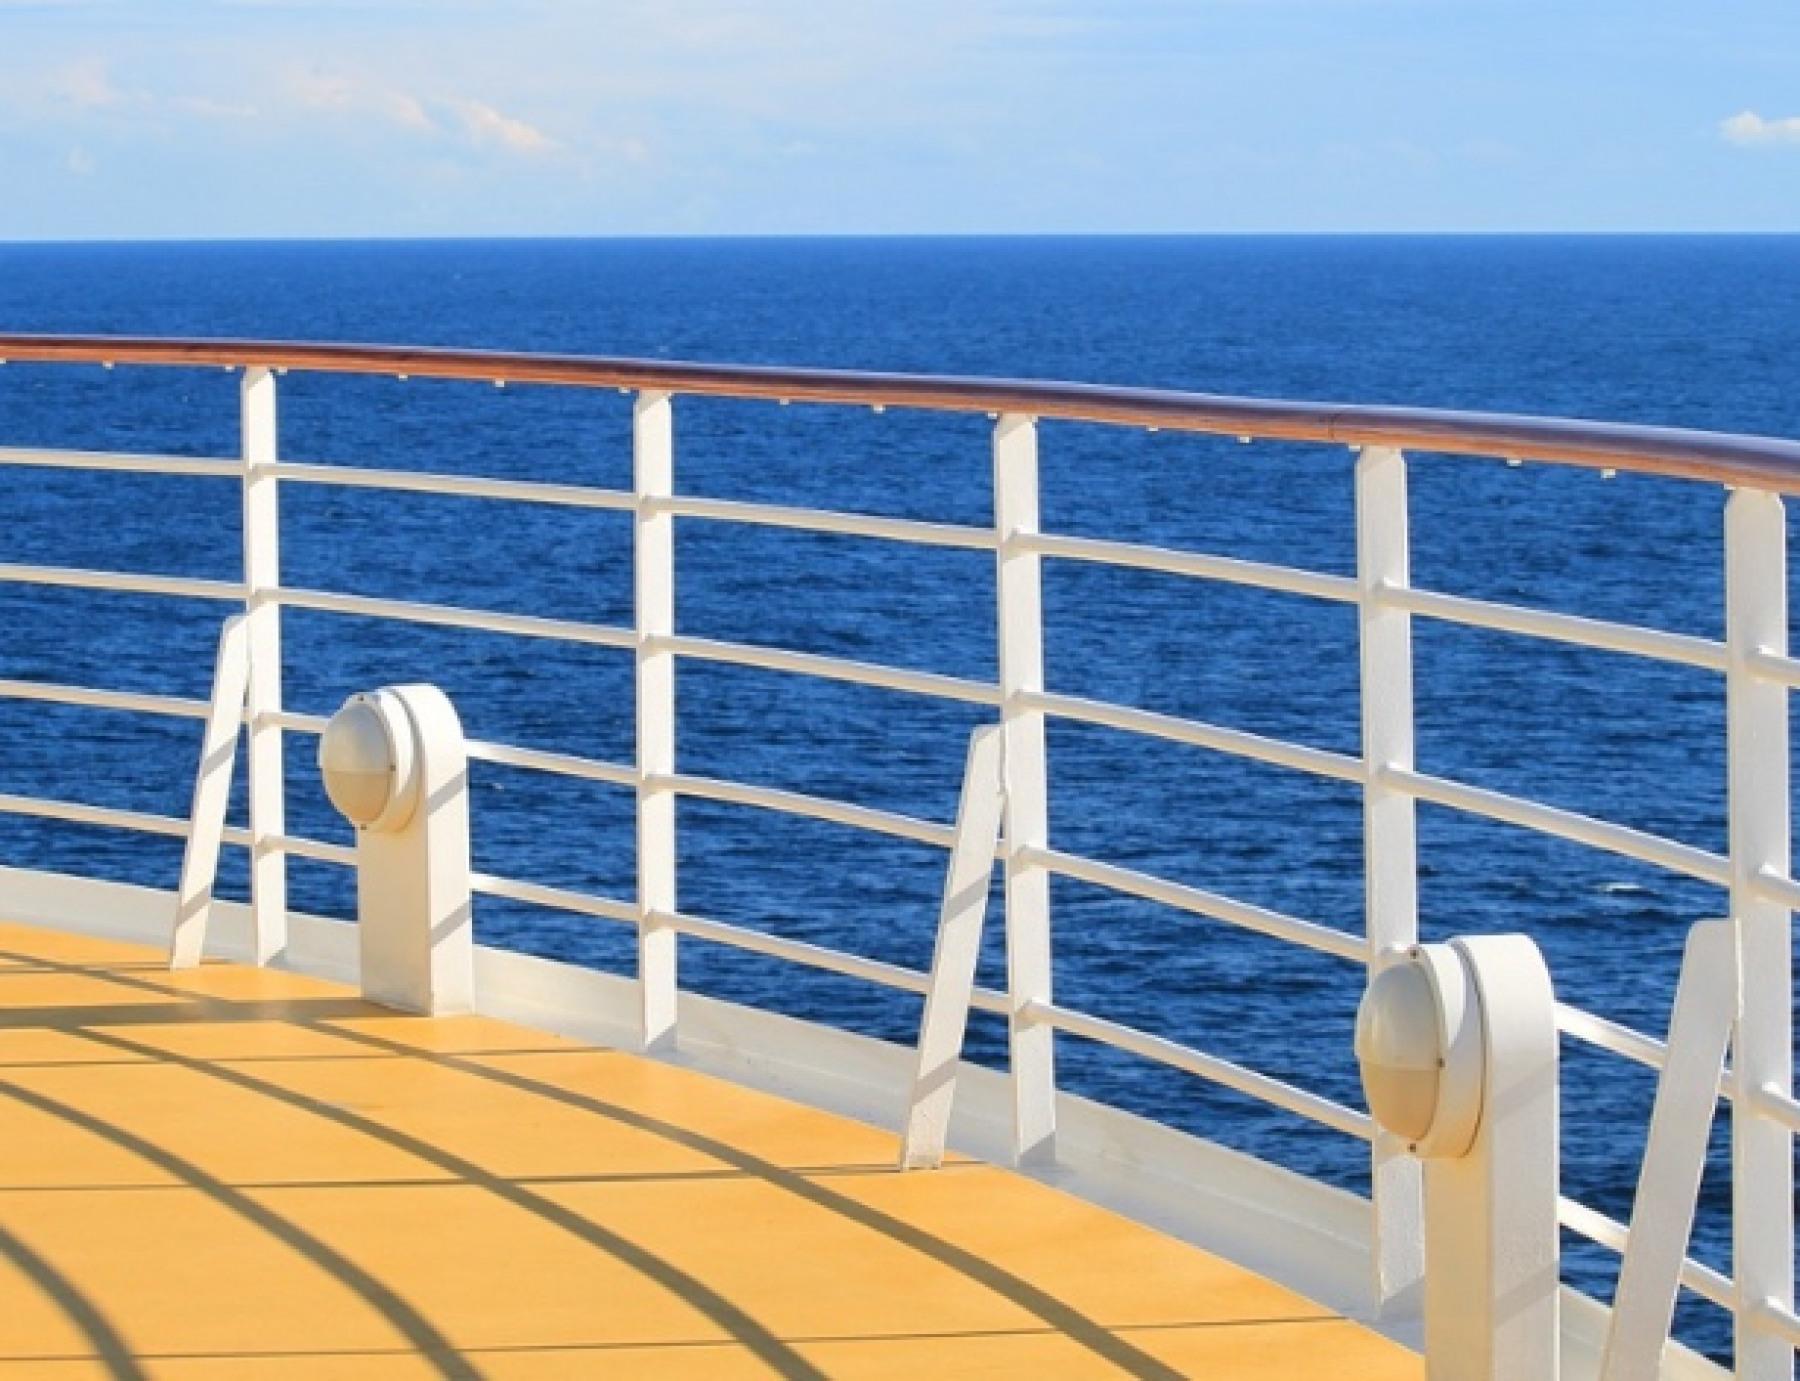 Carnival Cruise Lines Carnival Dream Interiorroulette-1.jpg